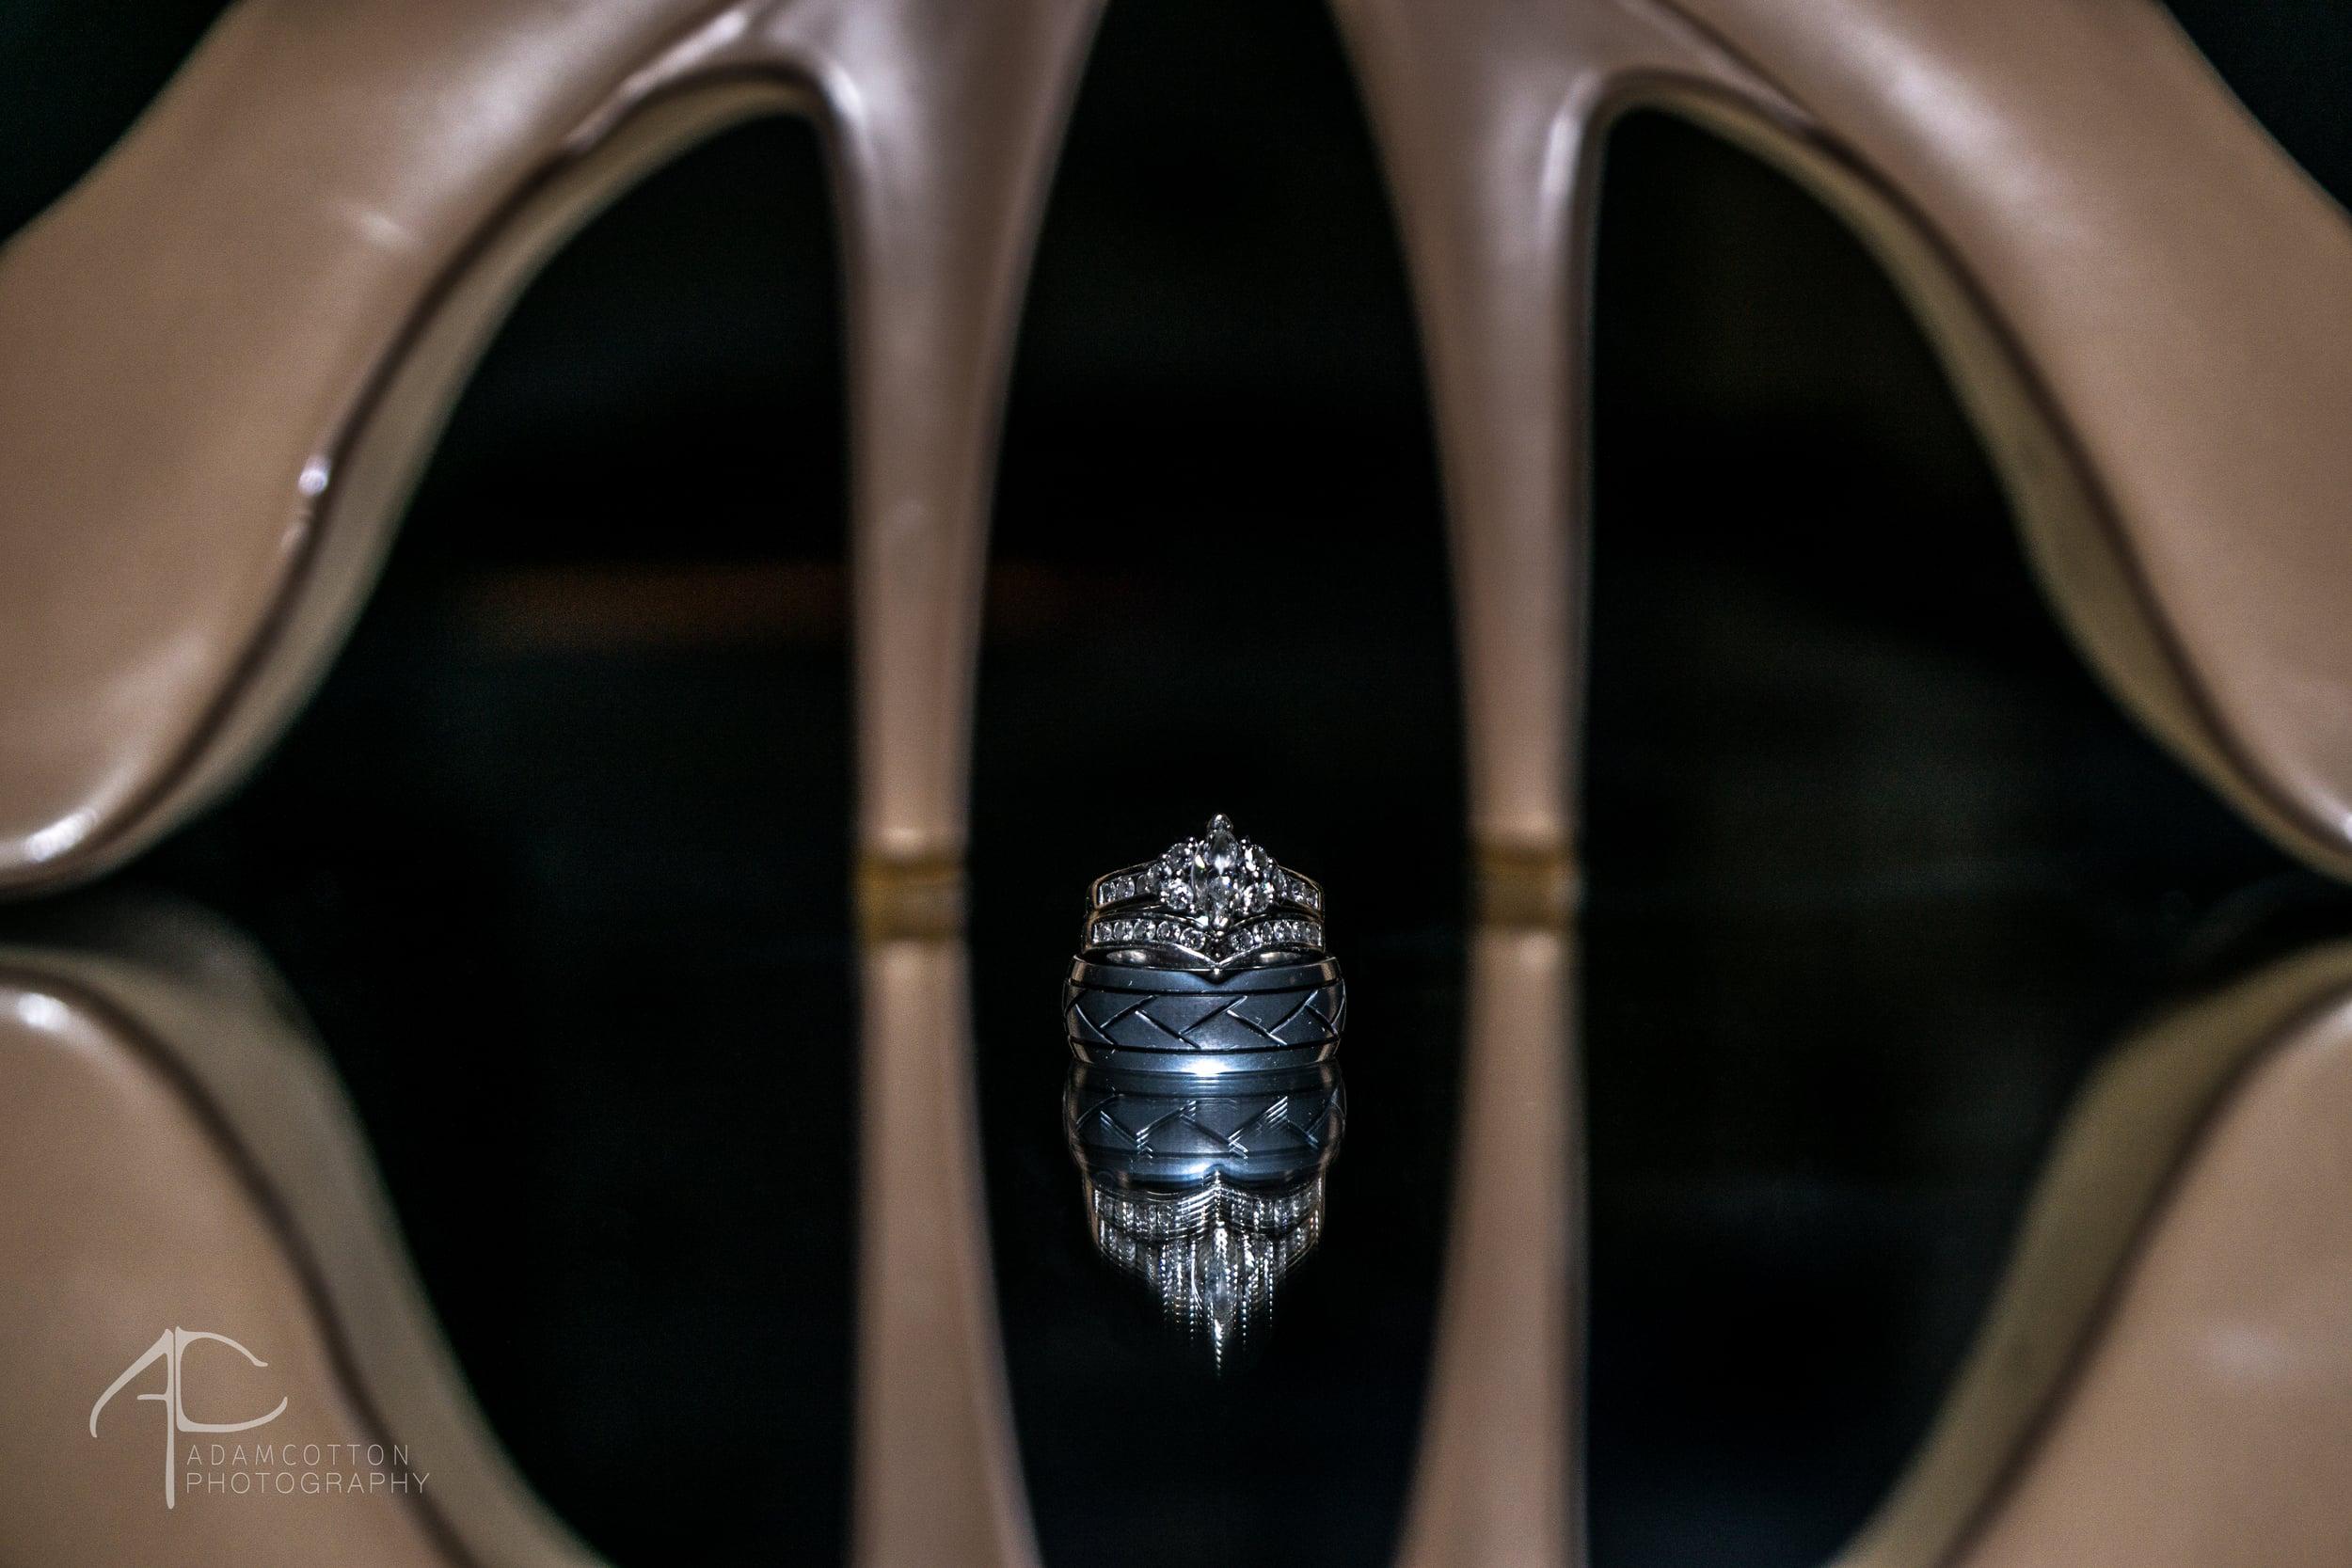 wedding_rings_and_heels_abstract_rotolight_neo.jpg